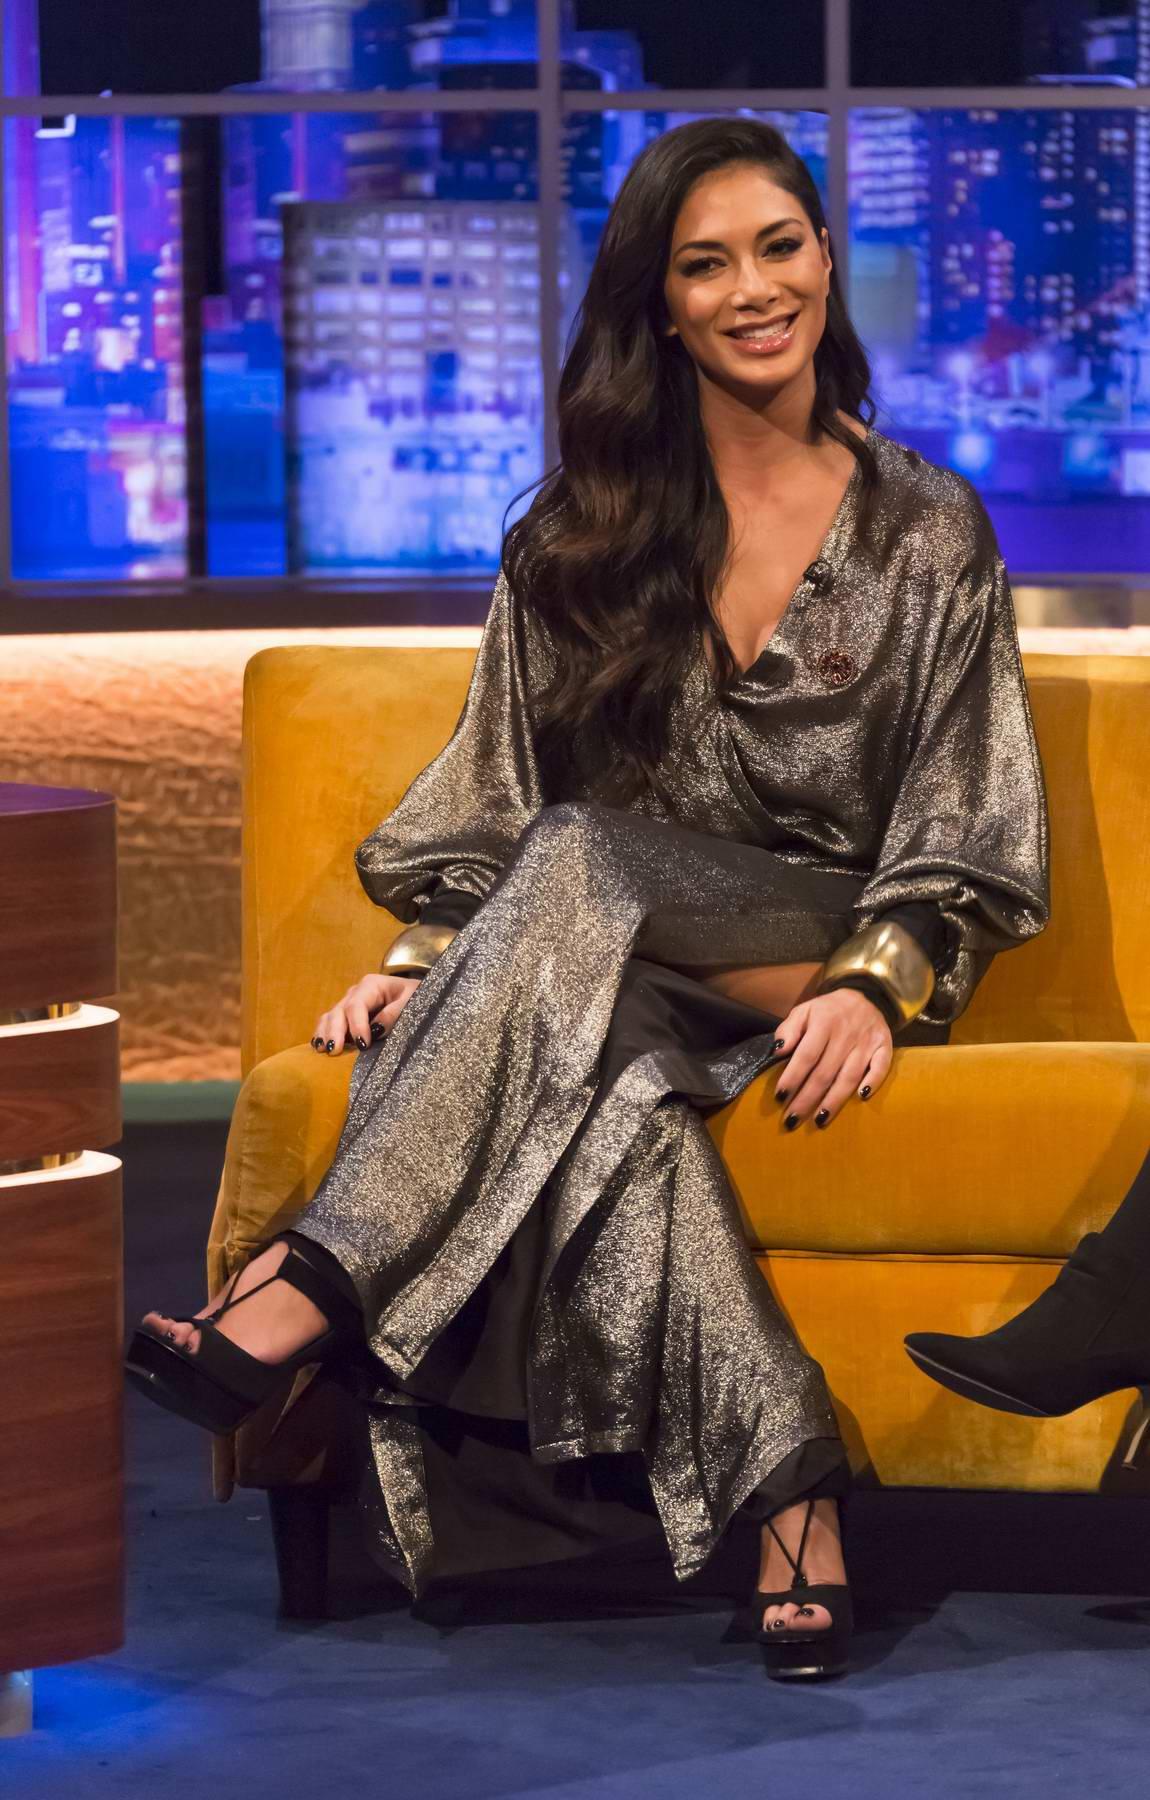 Nicole Scherzinger makes an appearance on 'The Jonathan Ross Show' in London